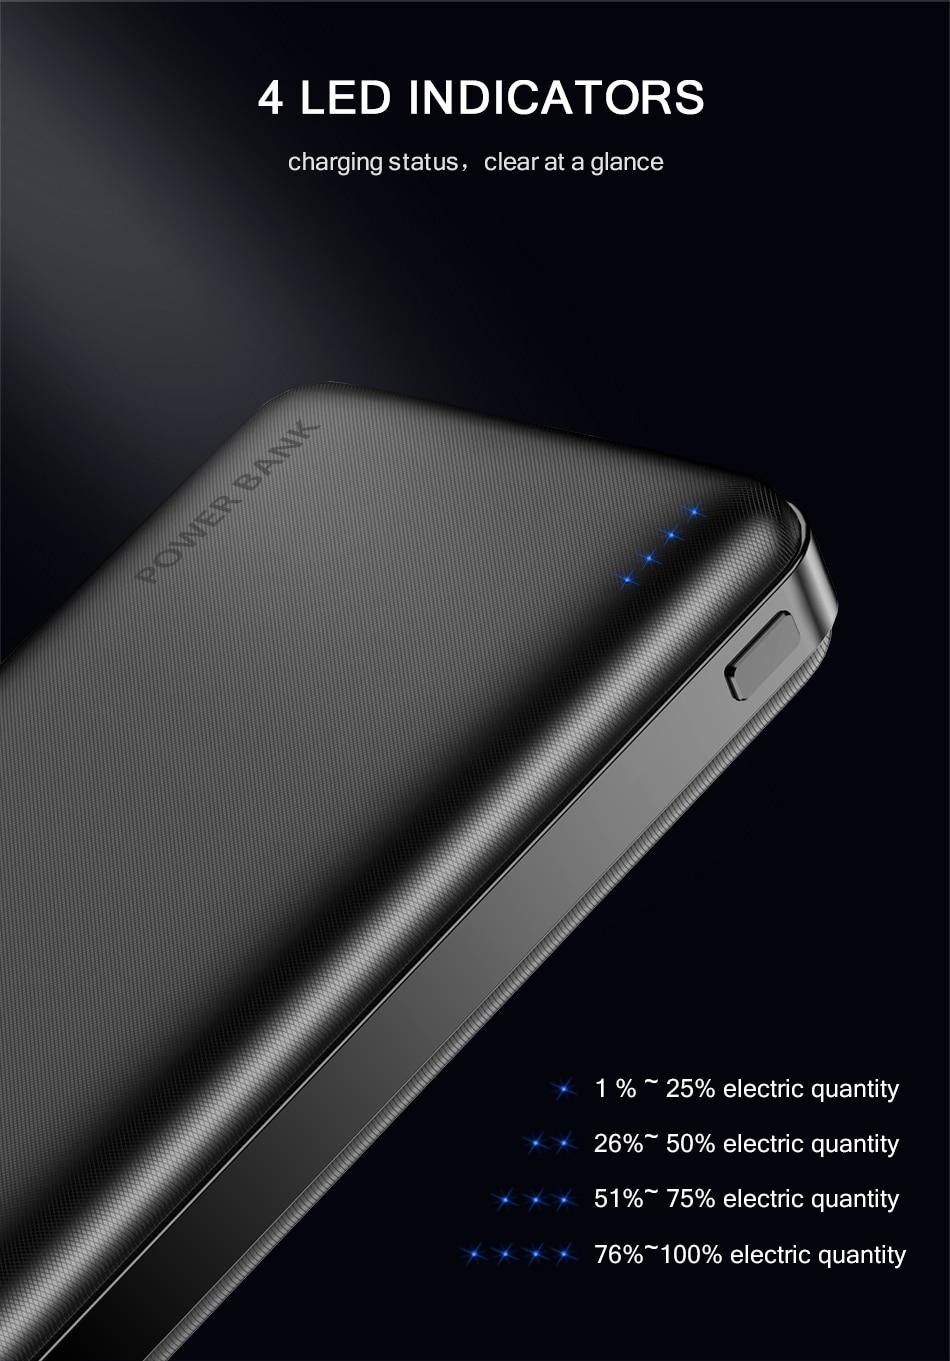 FLOVEME Power Bank 20000mAh Portable Charging Poverbank Mobile Phone External Battery Charger Powerbank 000 mAh for Xiaomi Mi 4